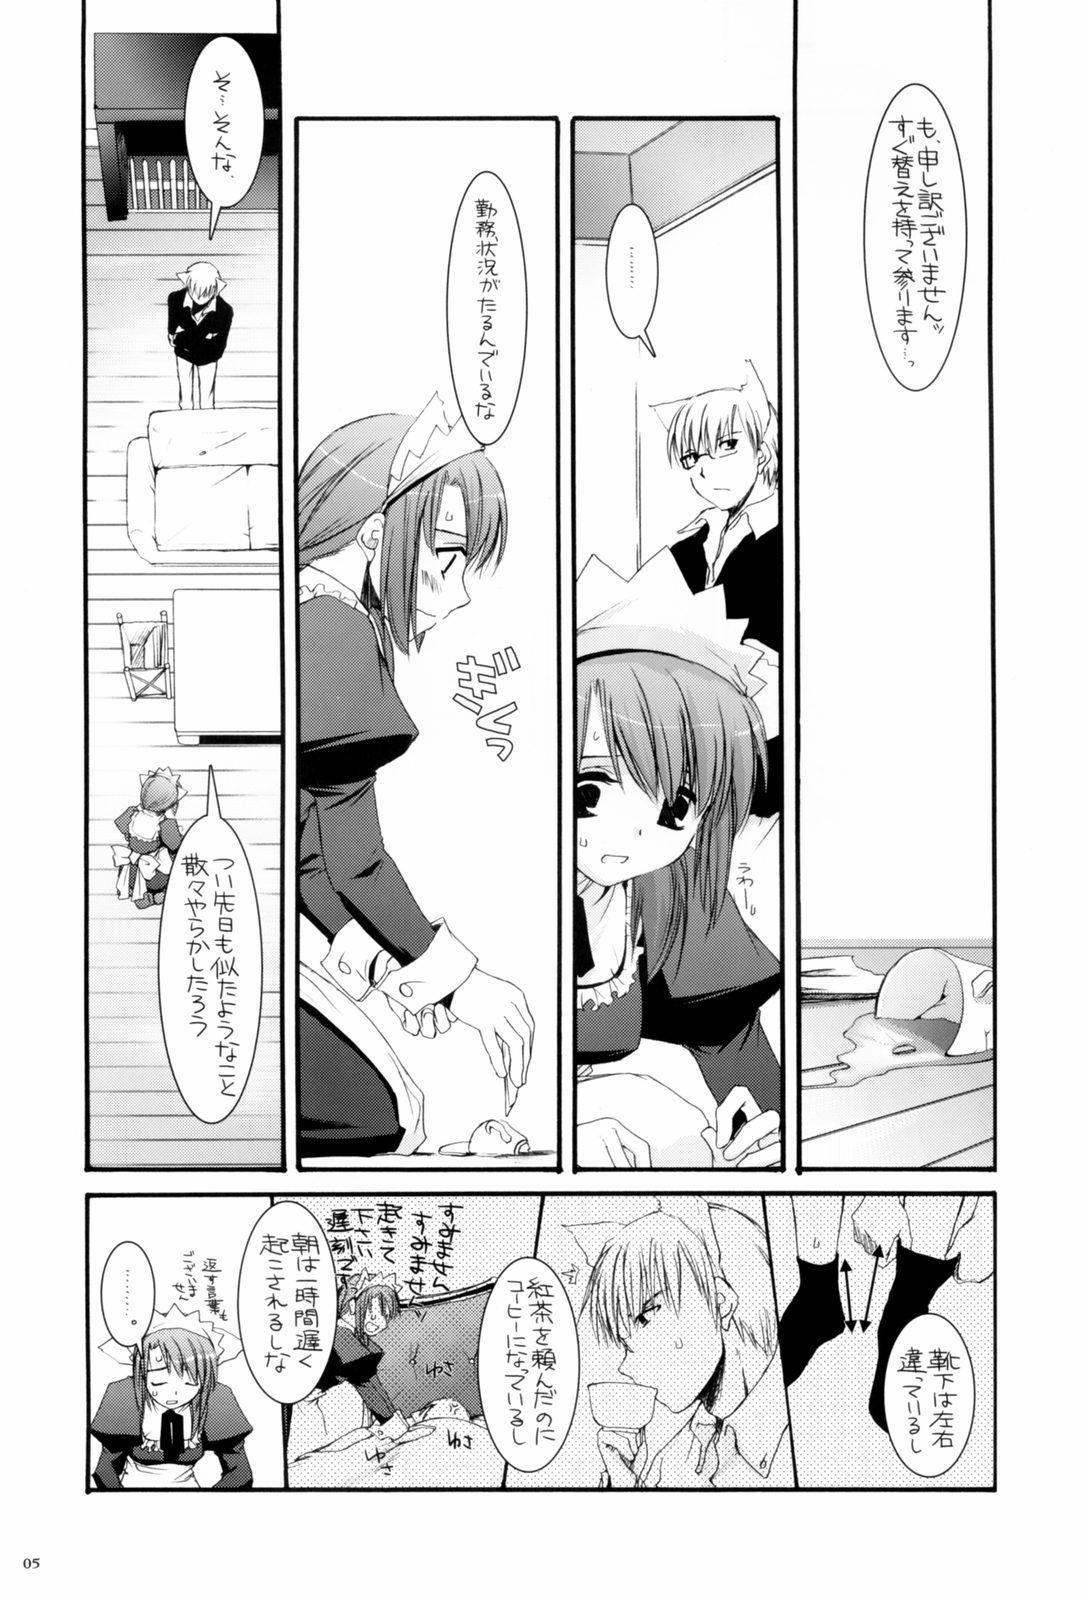 Seifuku Rakuen 13 - Costume Paradise 13 3